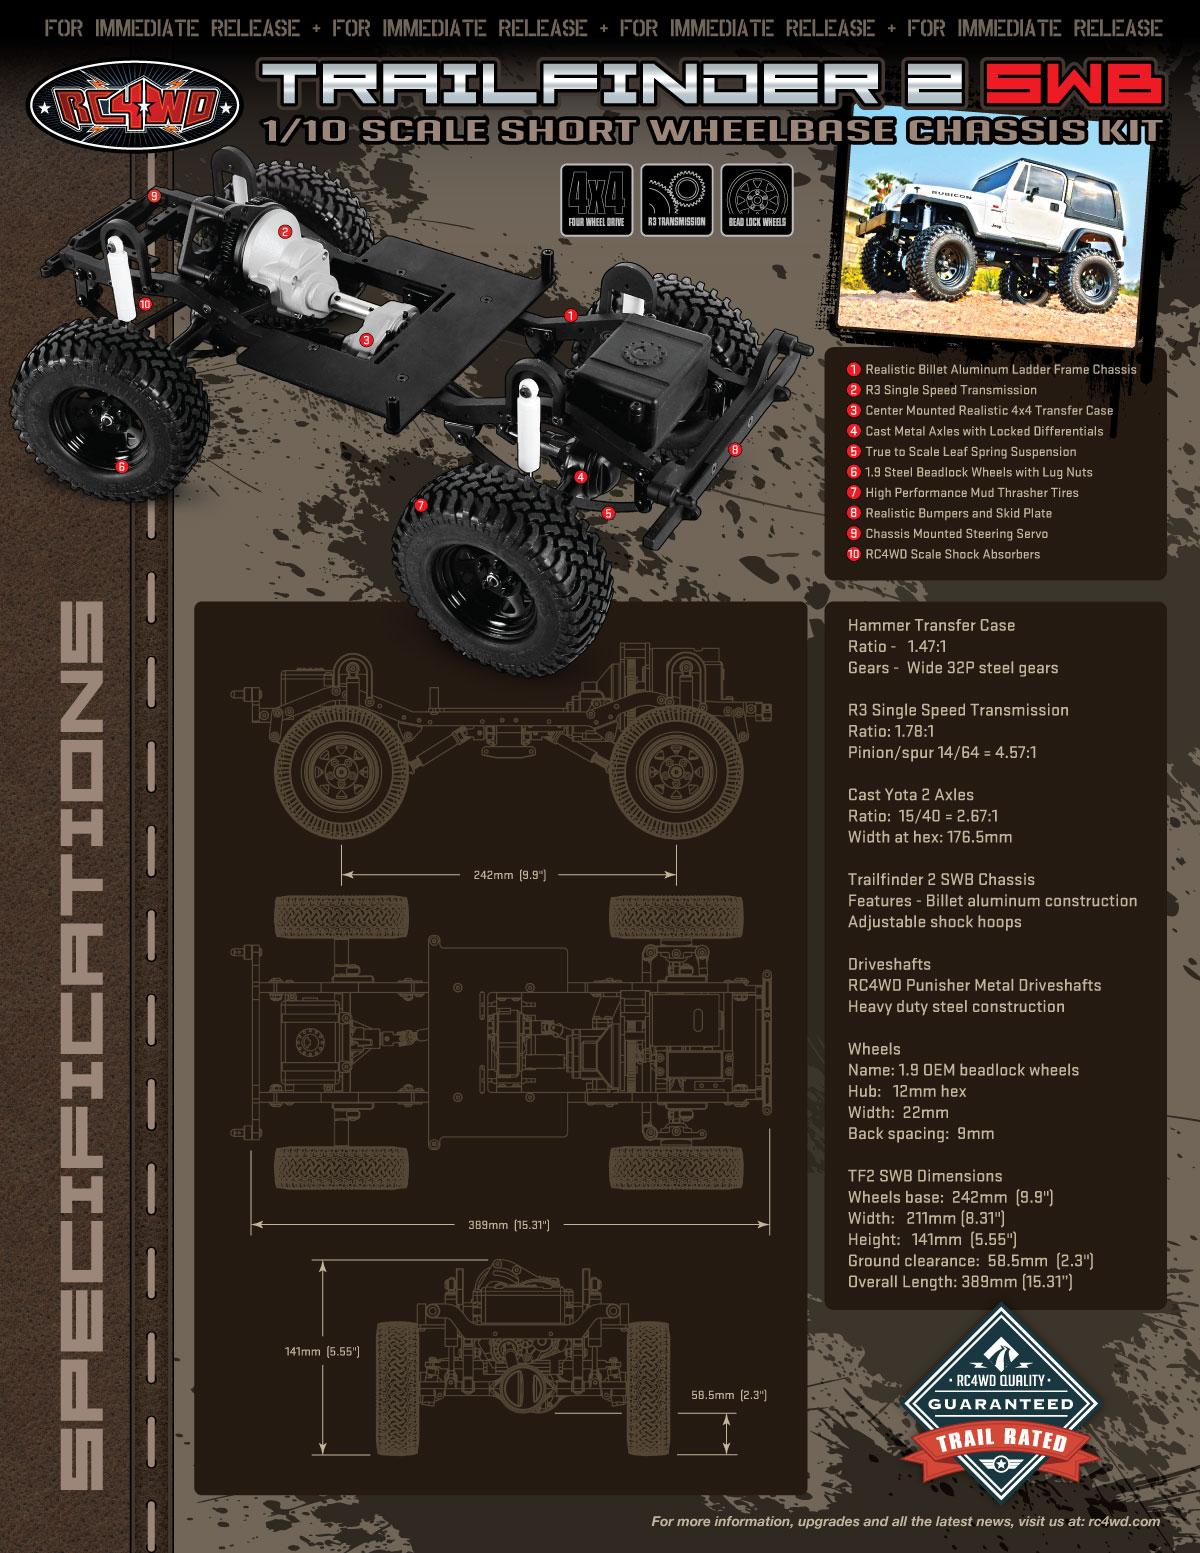 http://www.beadlok.com/product/images/ASD/Z-K0045-5Specs-print.jpg